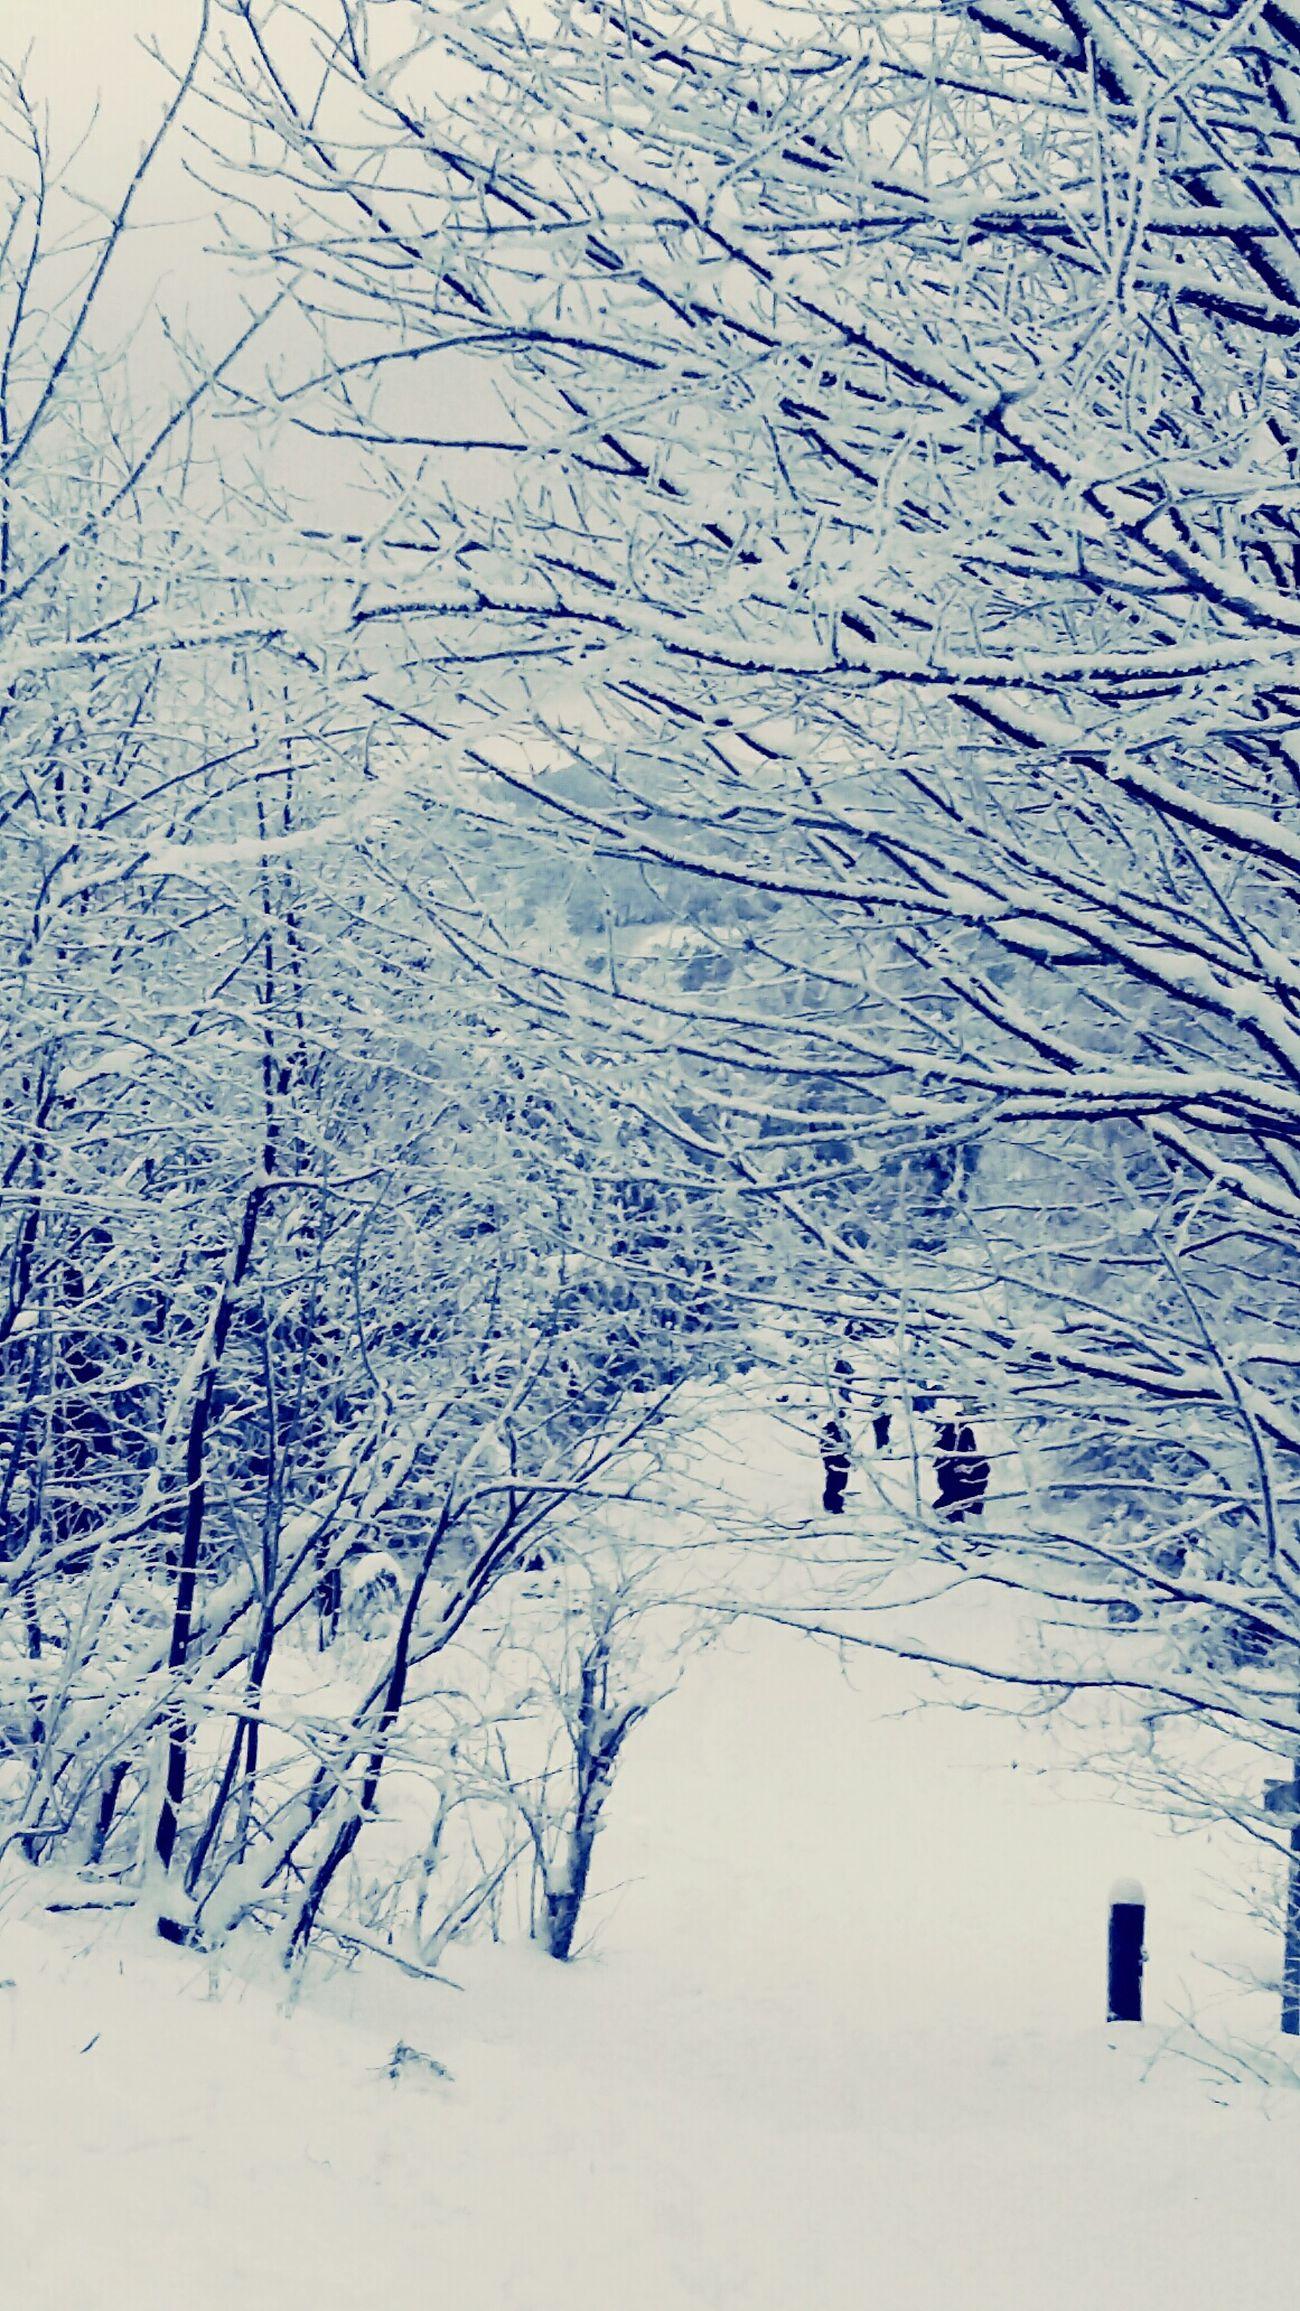 Shades Of Blue Winter 2016 Winterwonderland Winter B&w Street Photography My Best Photo 2015 Black And White Wintertime Germany Sachsen Snow Snow Day Snowing ❄ Winterwalk Winterwald